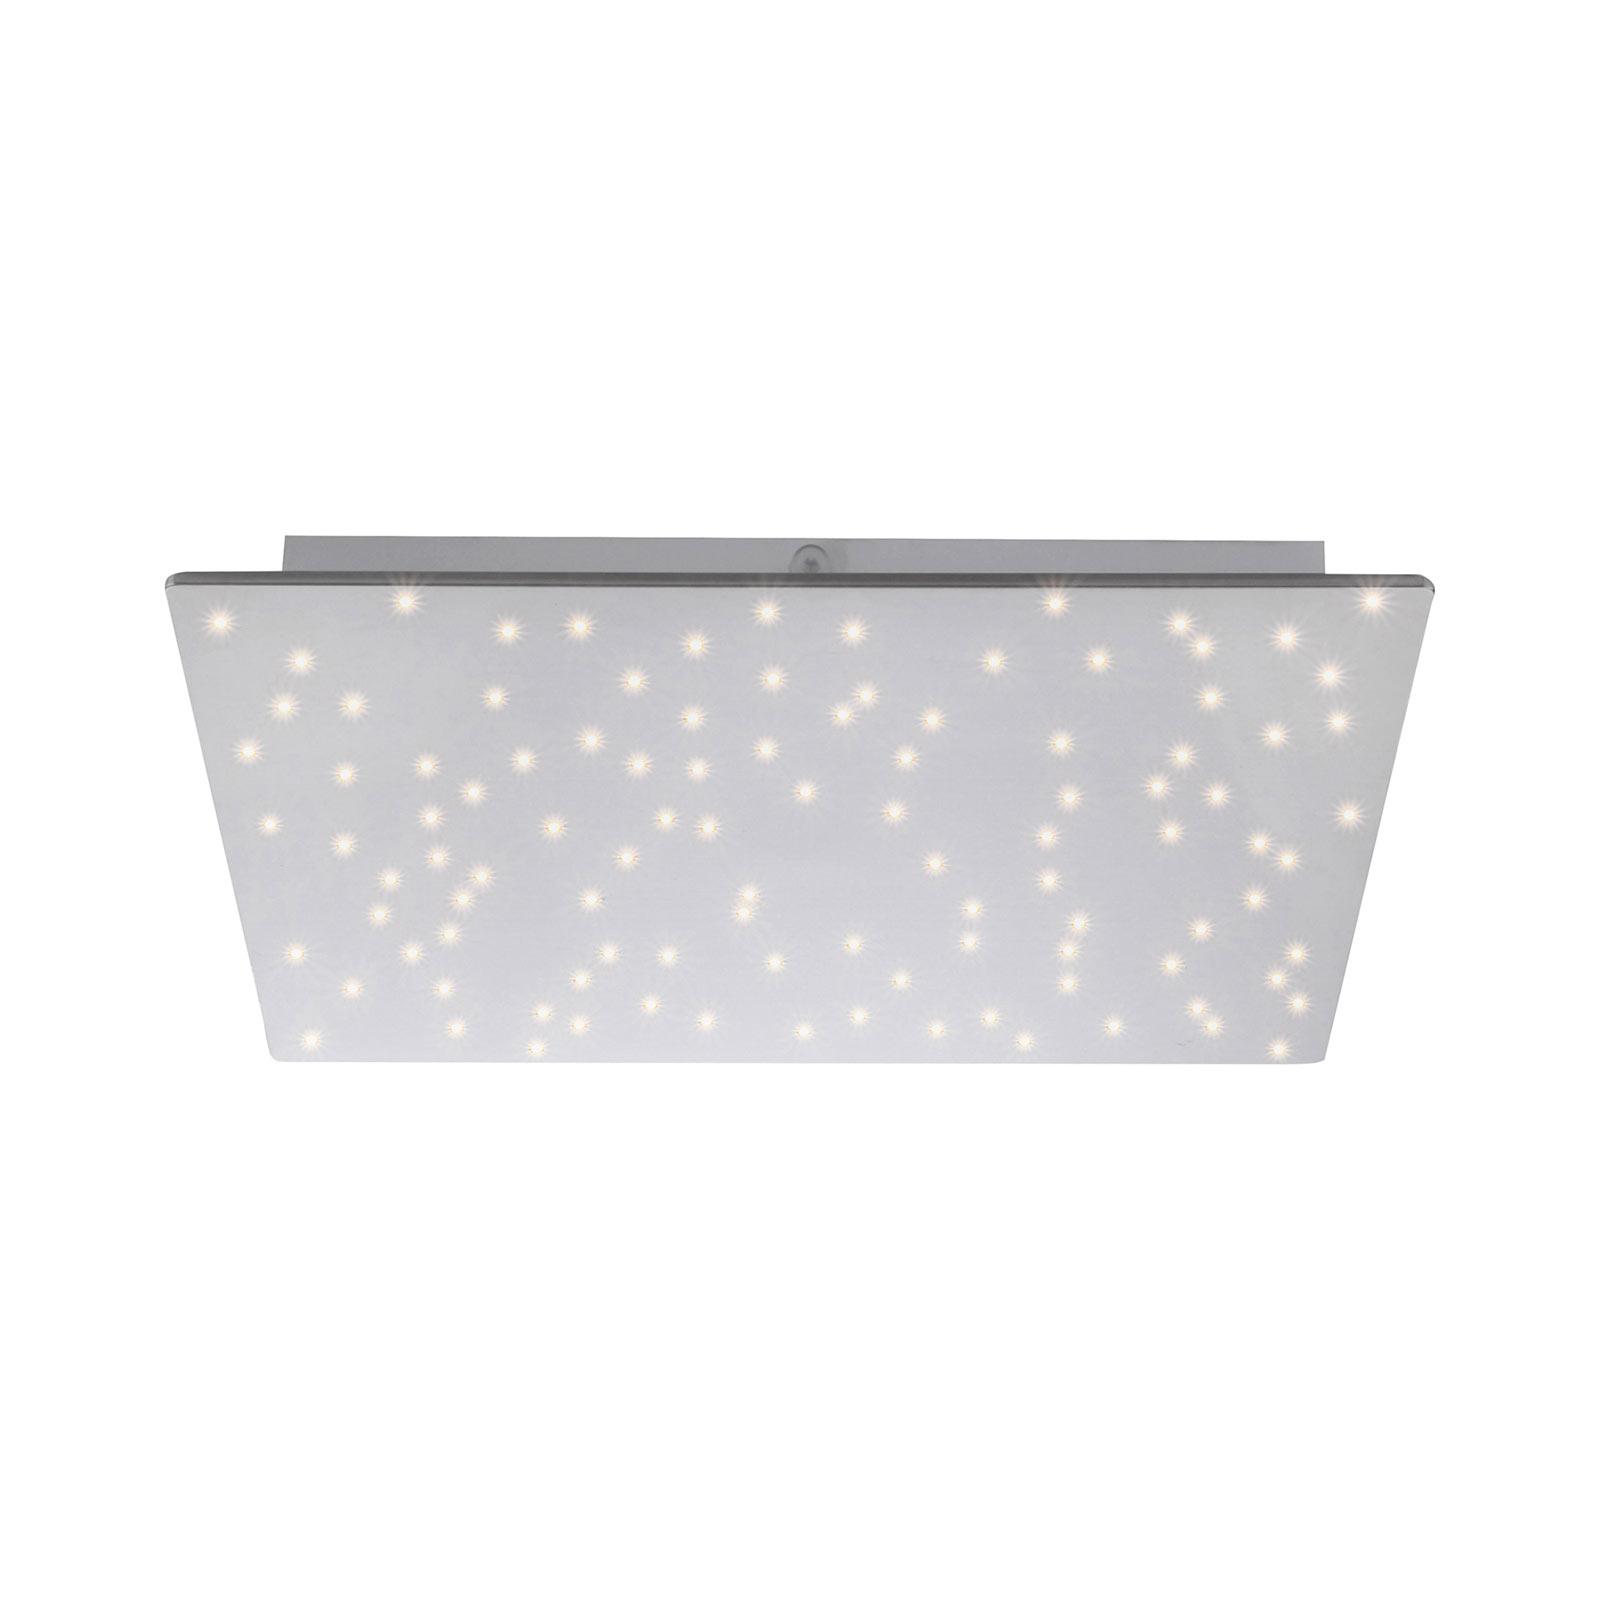 Sparkle LED-taklampe, tunable white, 45 x 45 cm